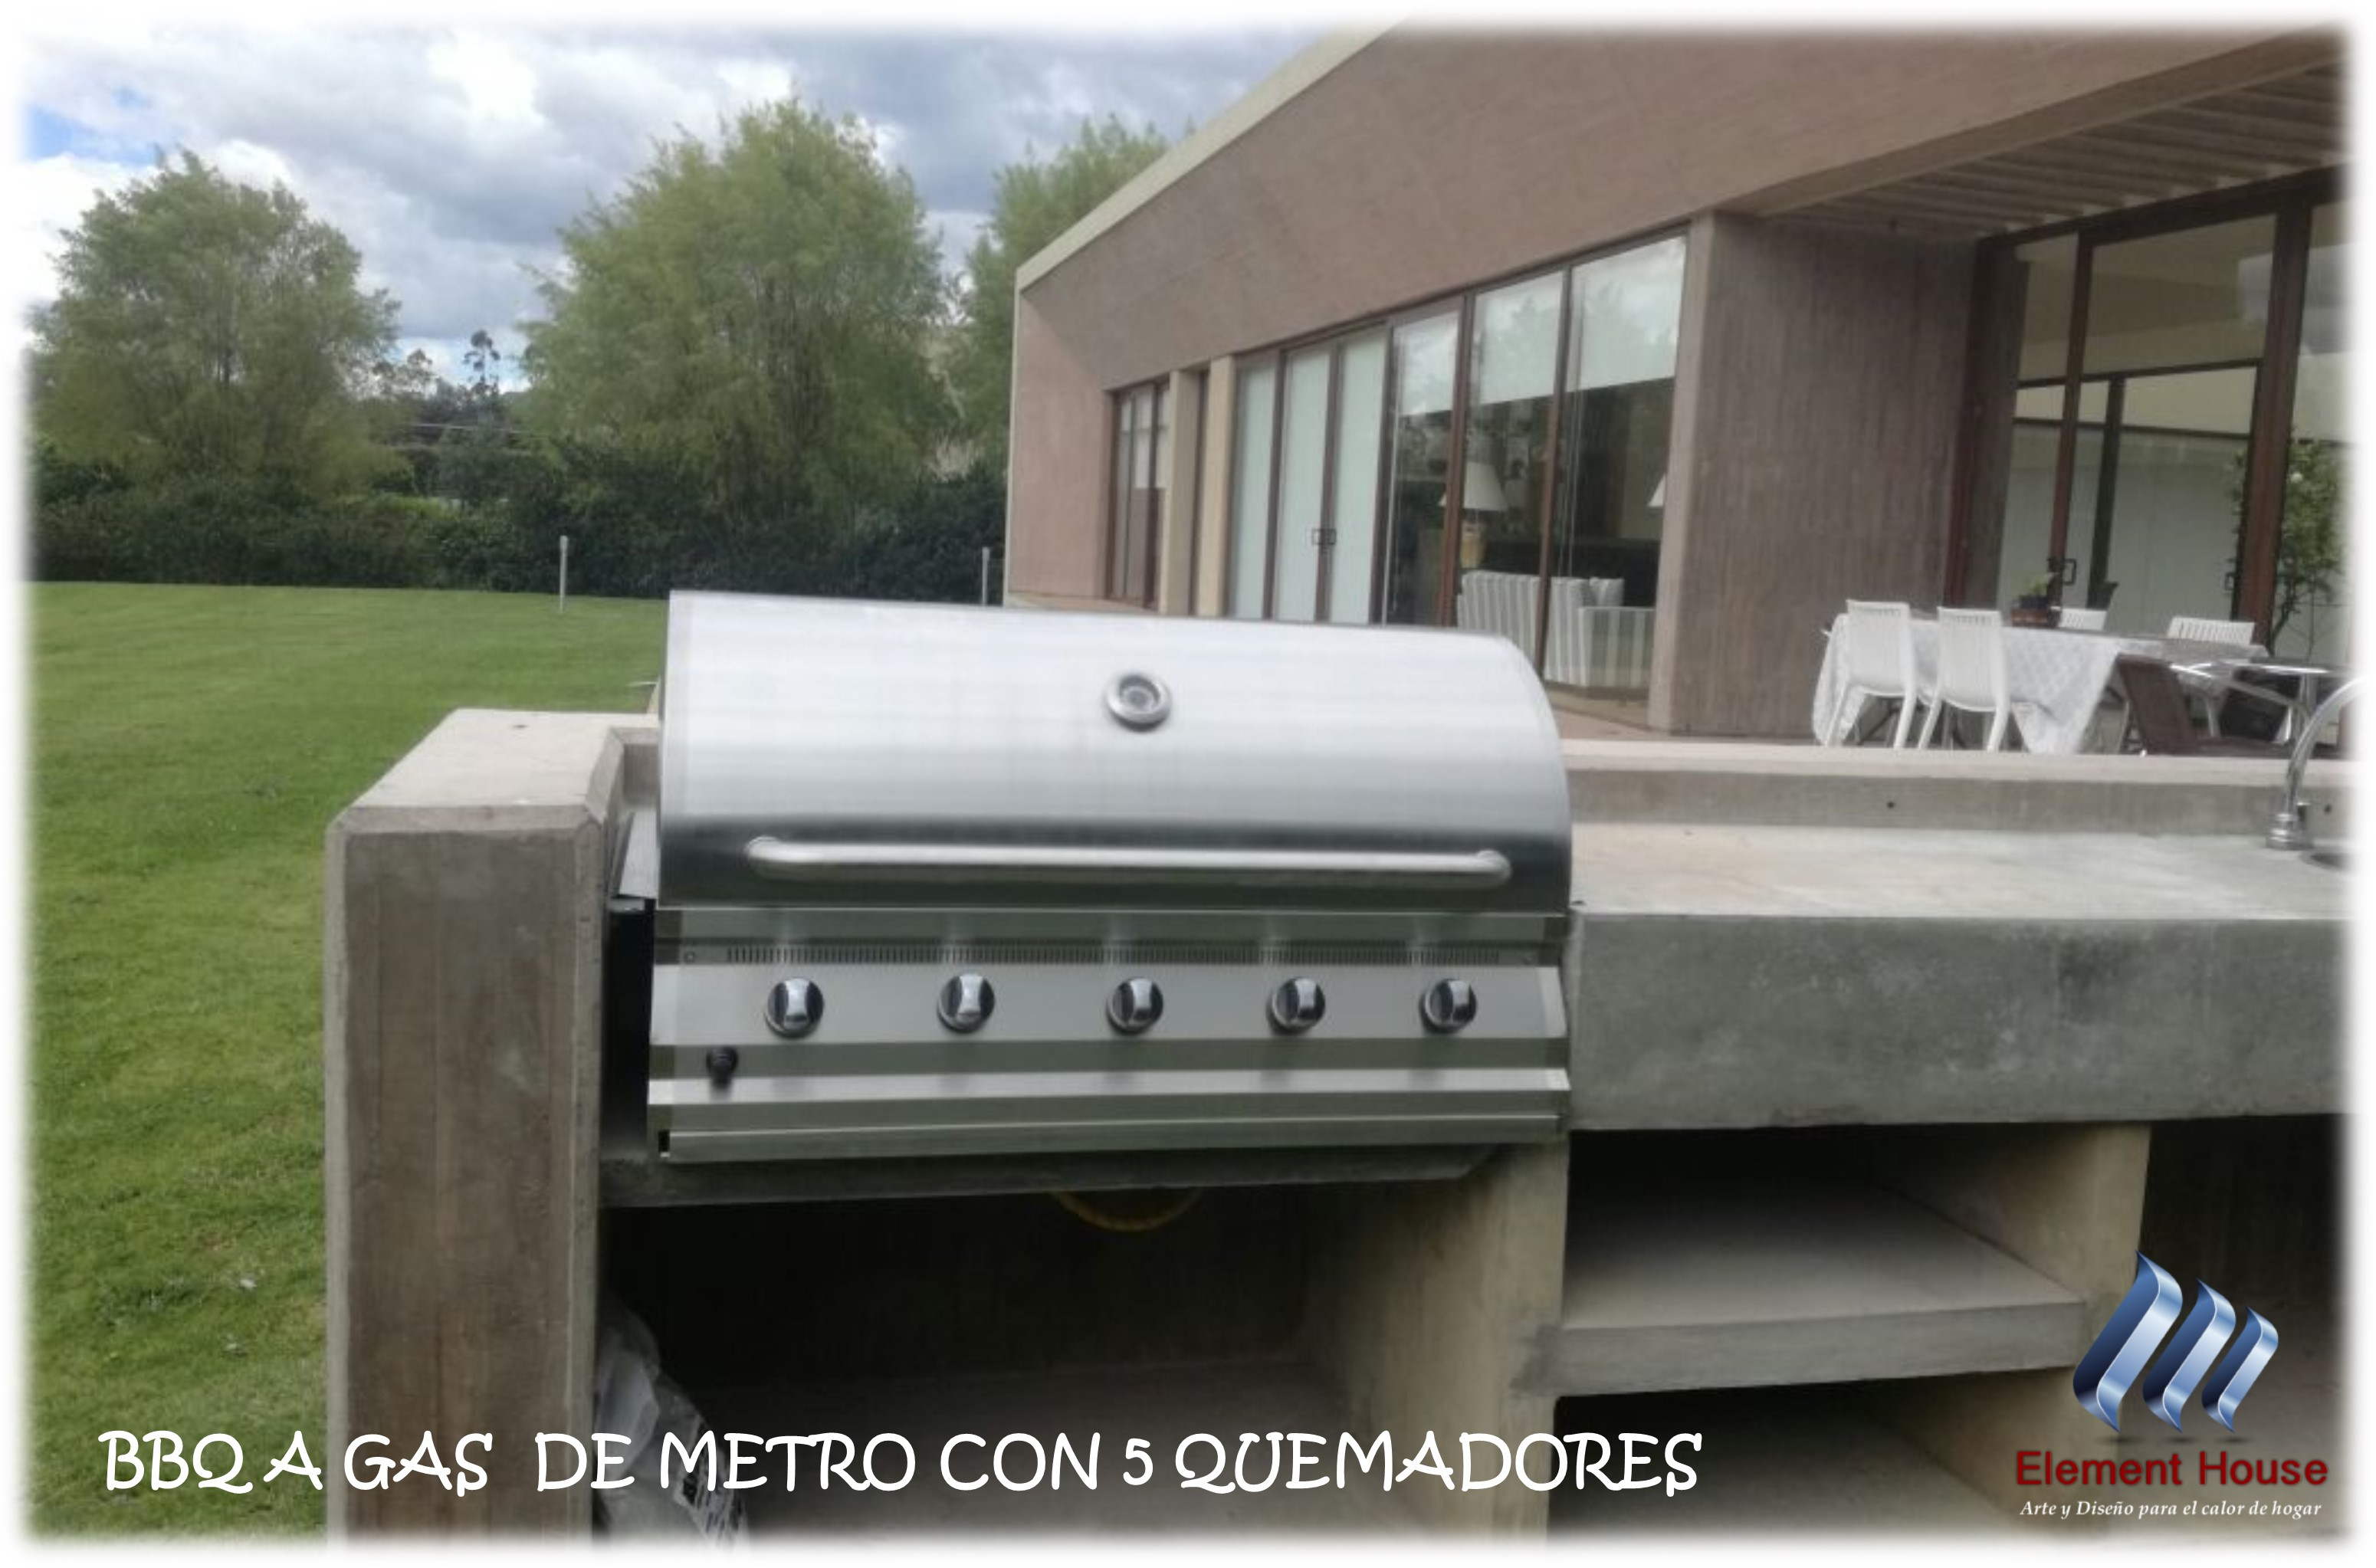 BBQ ELEMENT HOUSE (6)